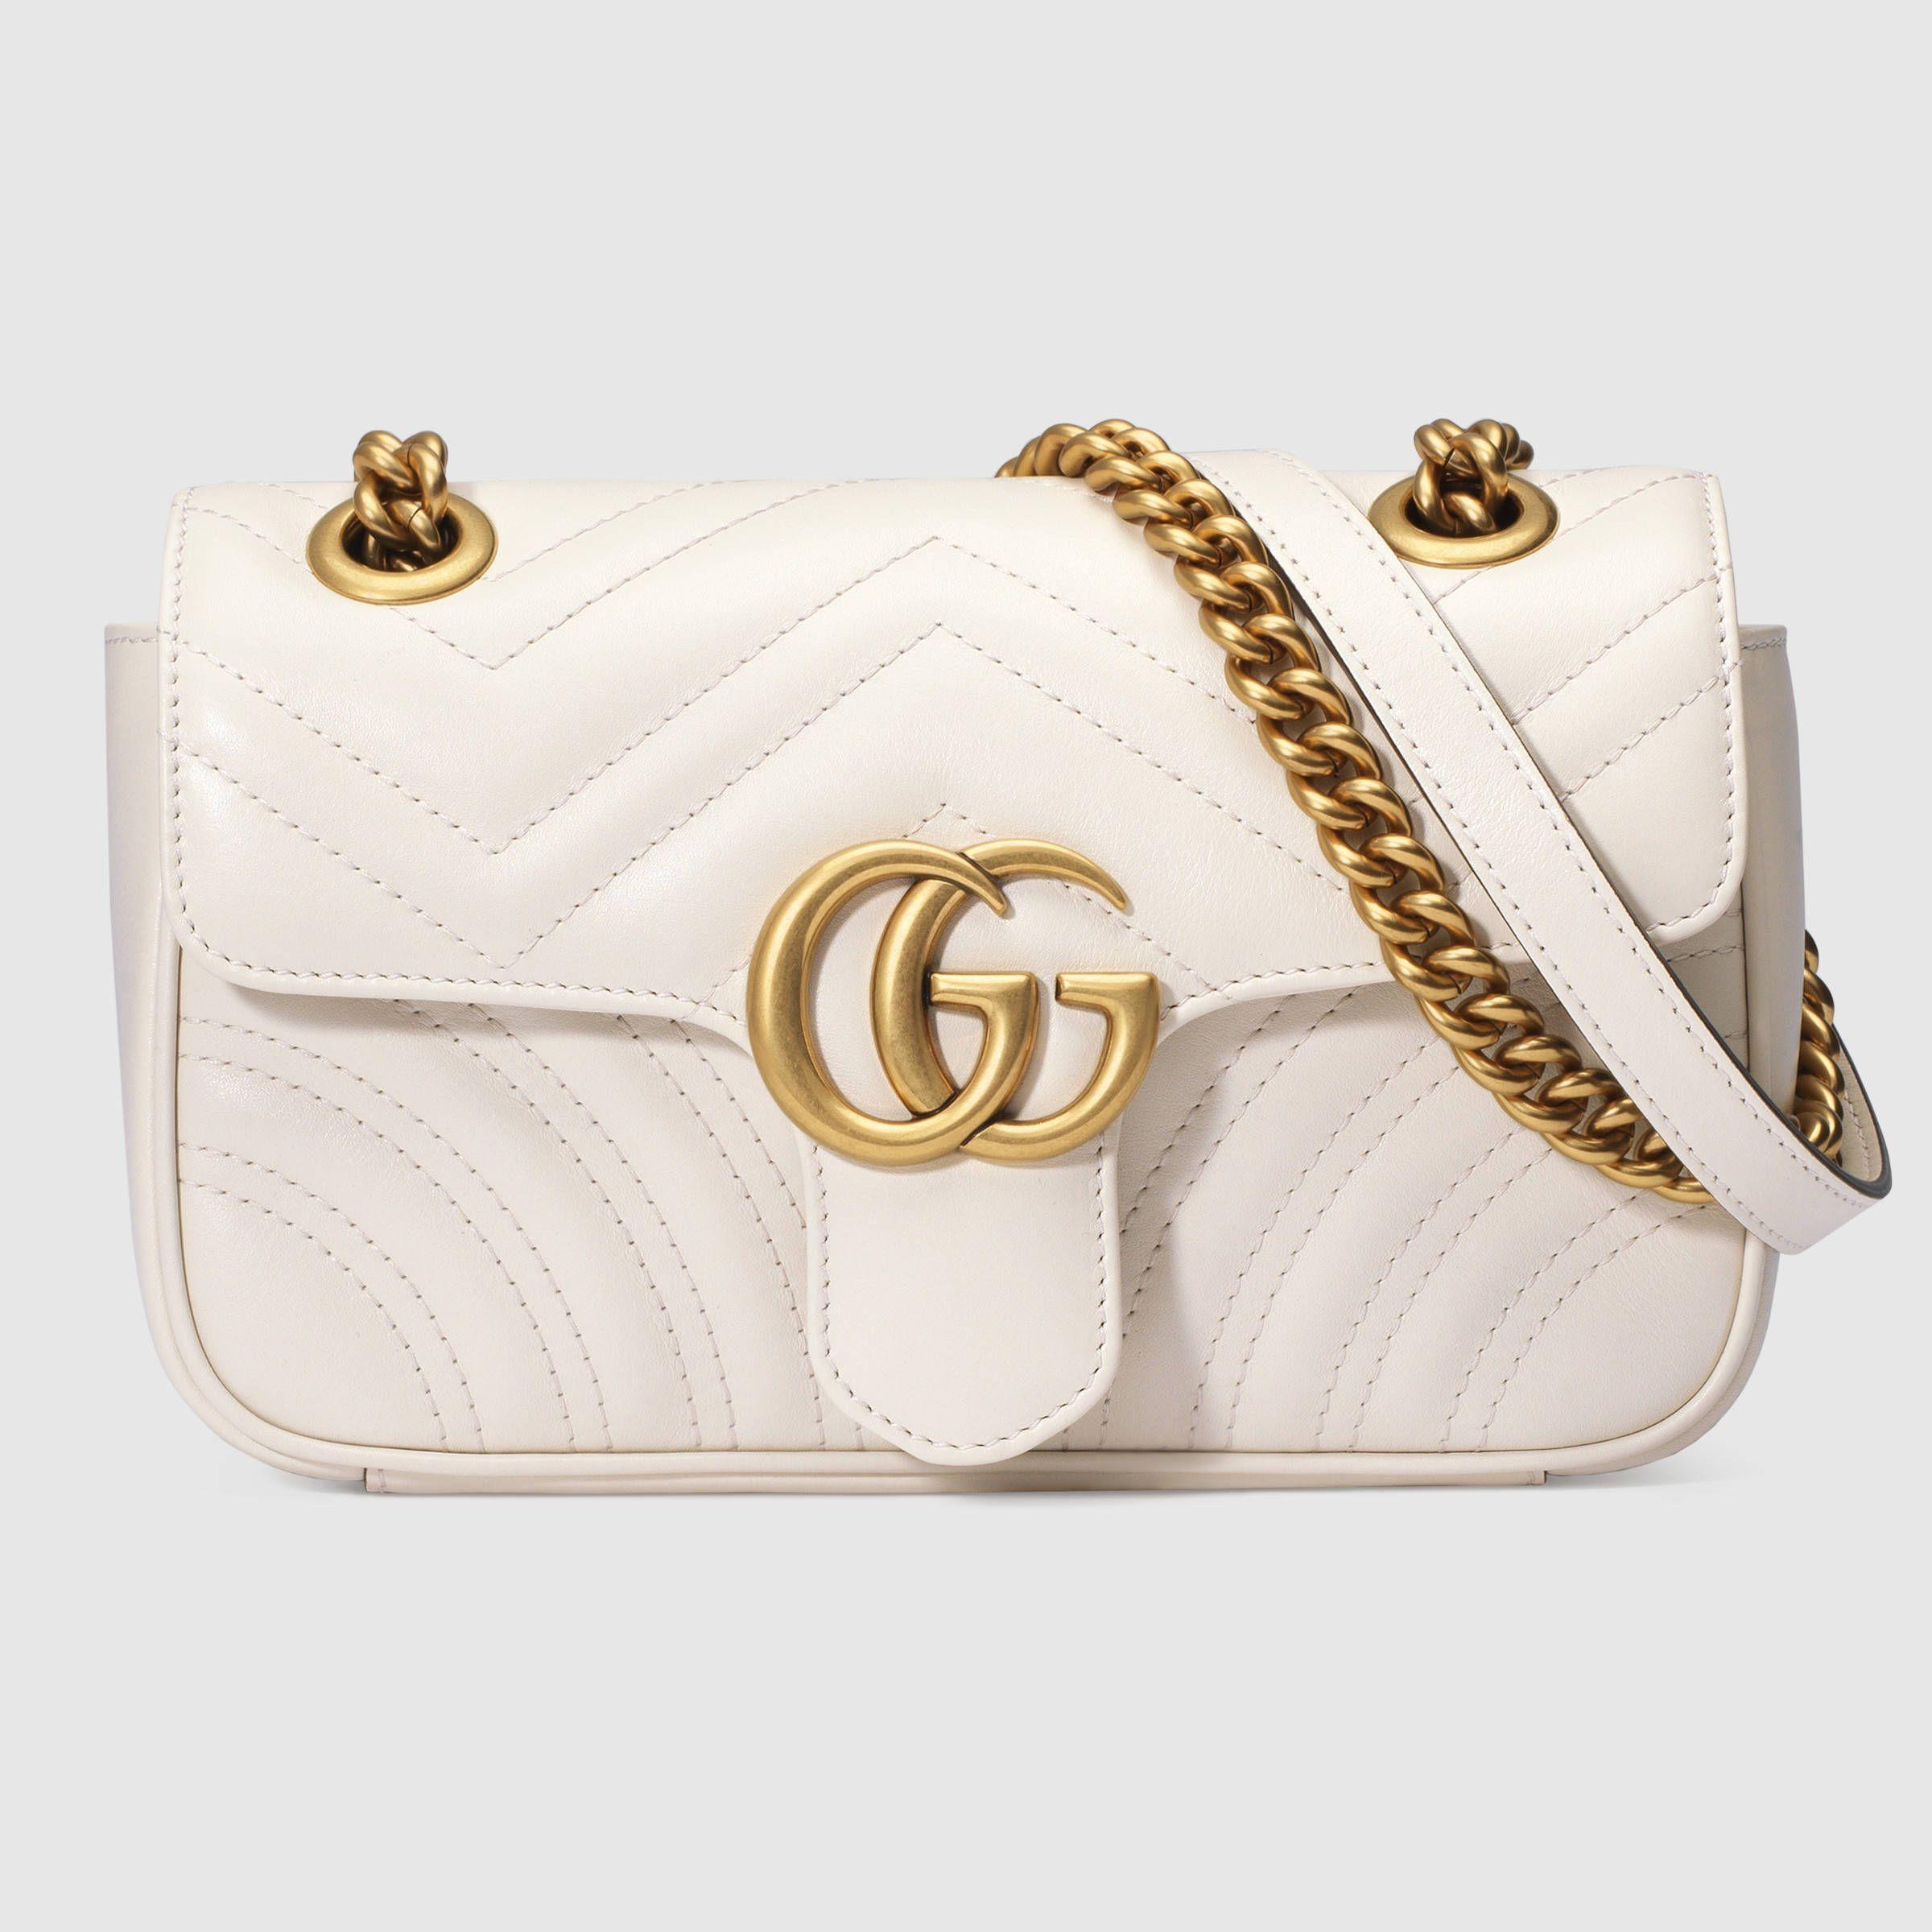 Photo of Gucci GG Marmont matelassé mini bag